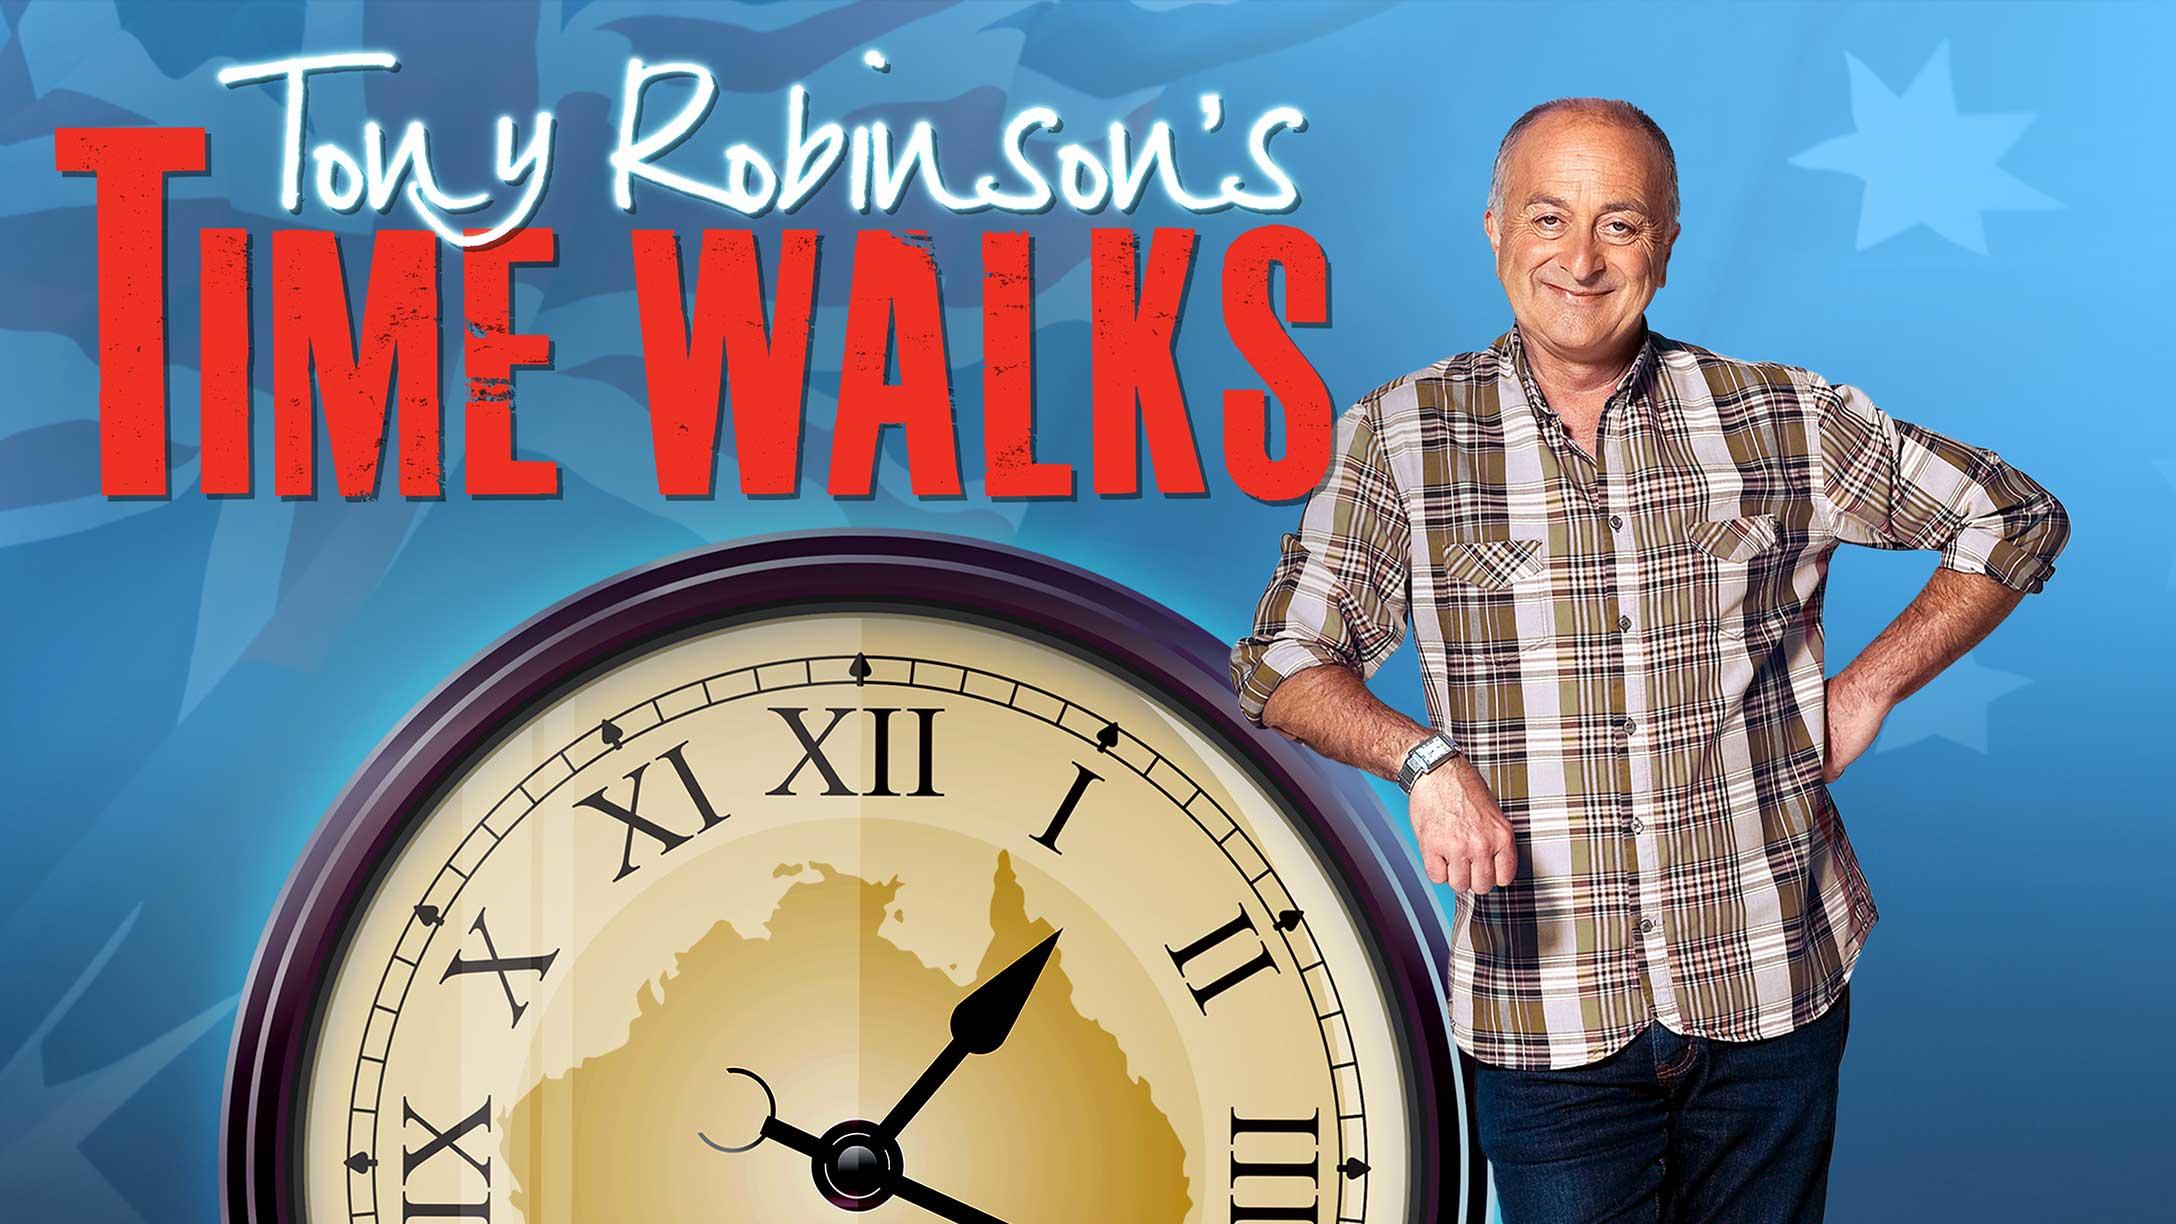 Tony-Robinson-Time-Walks-Landscape-2176-x-1224